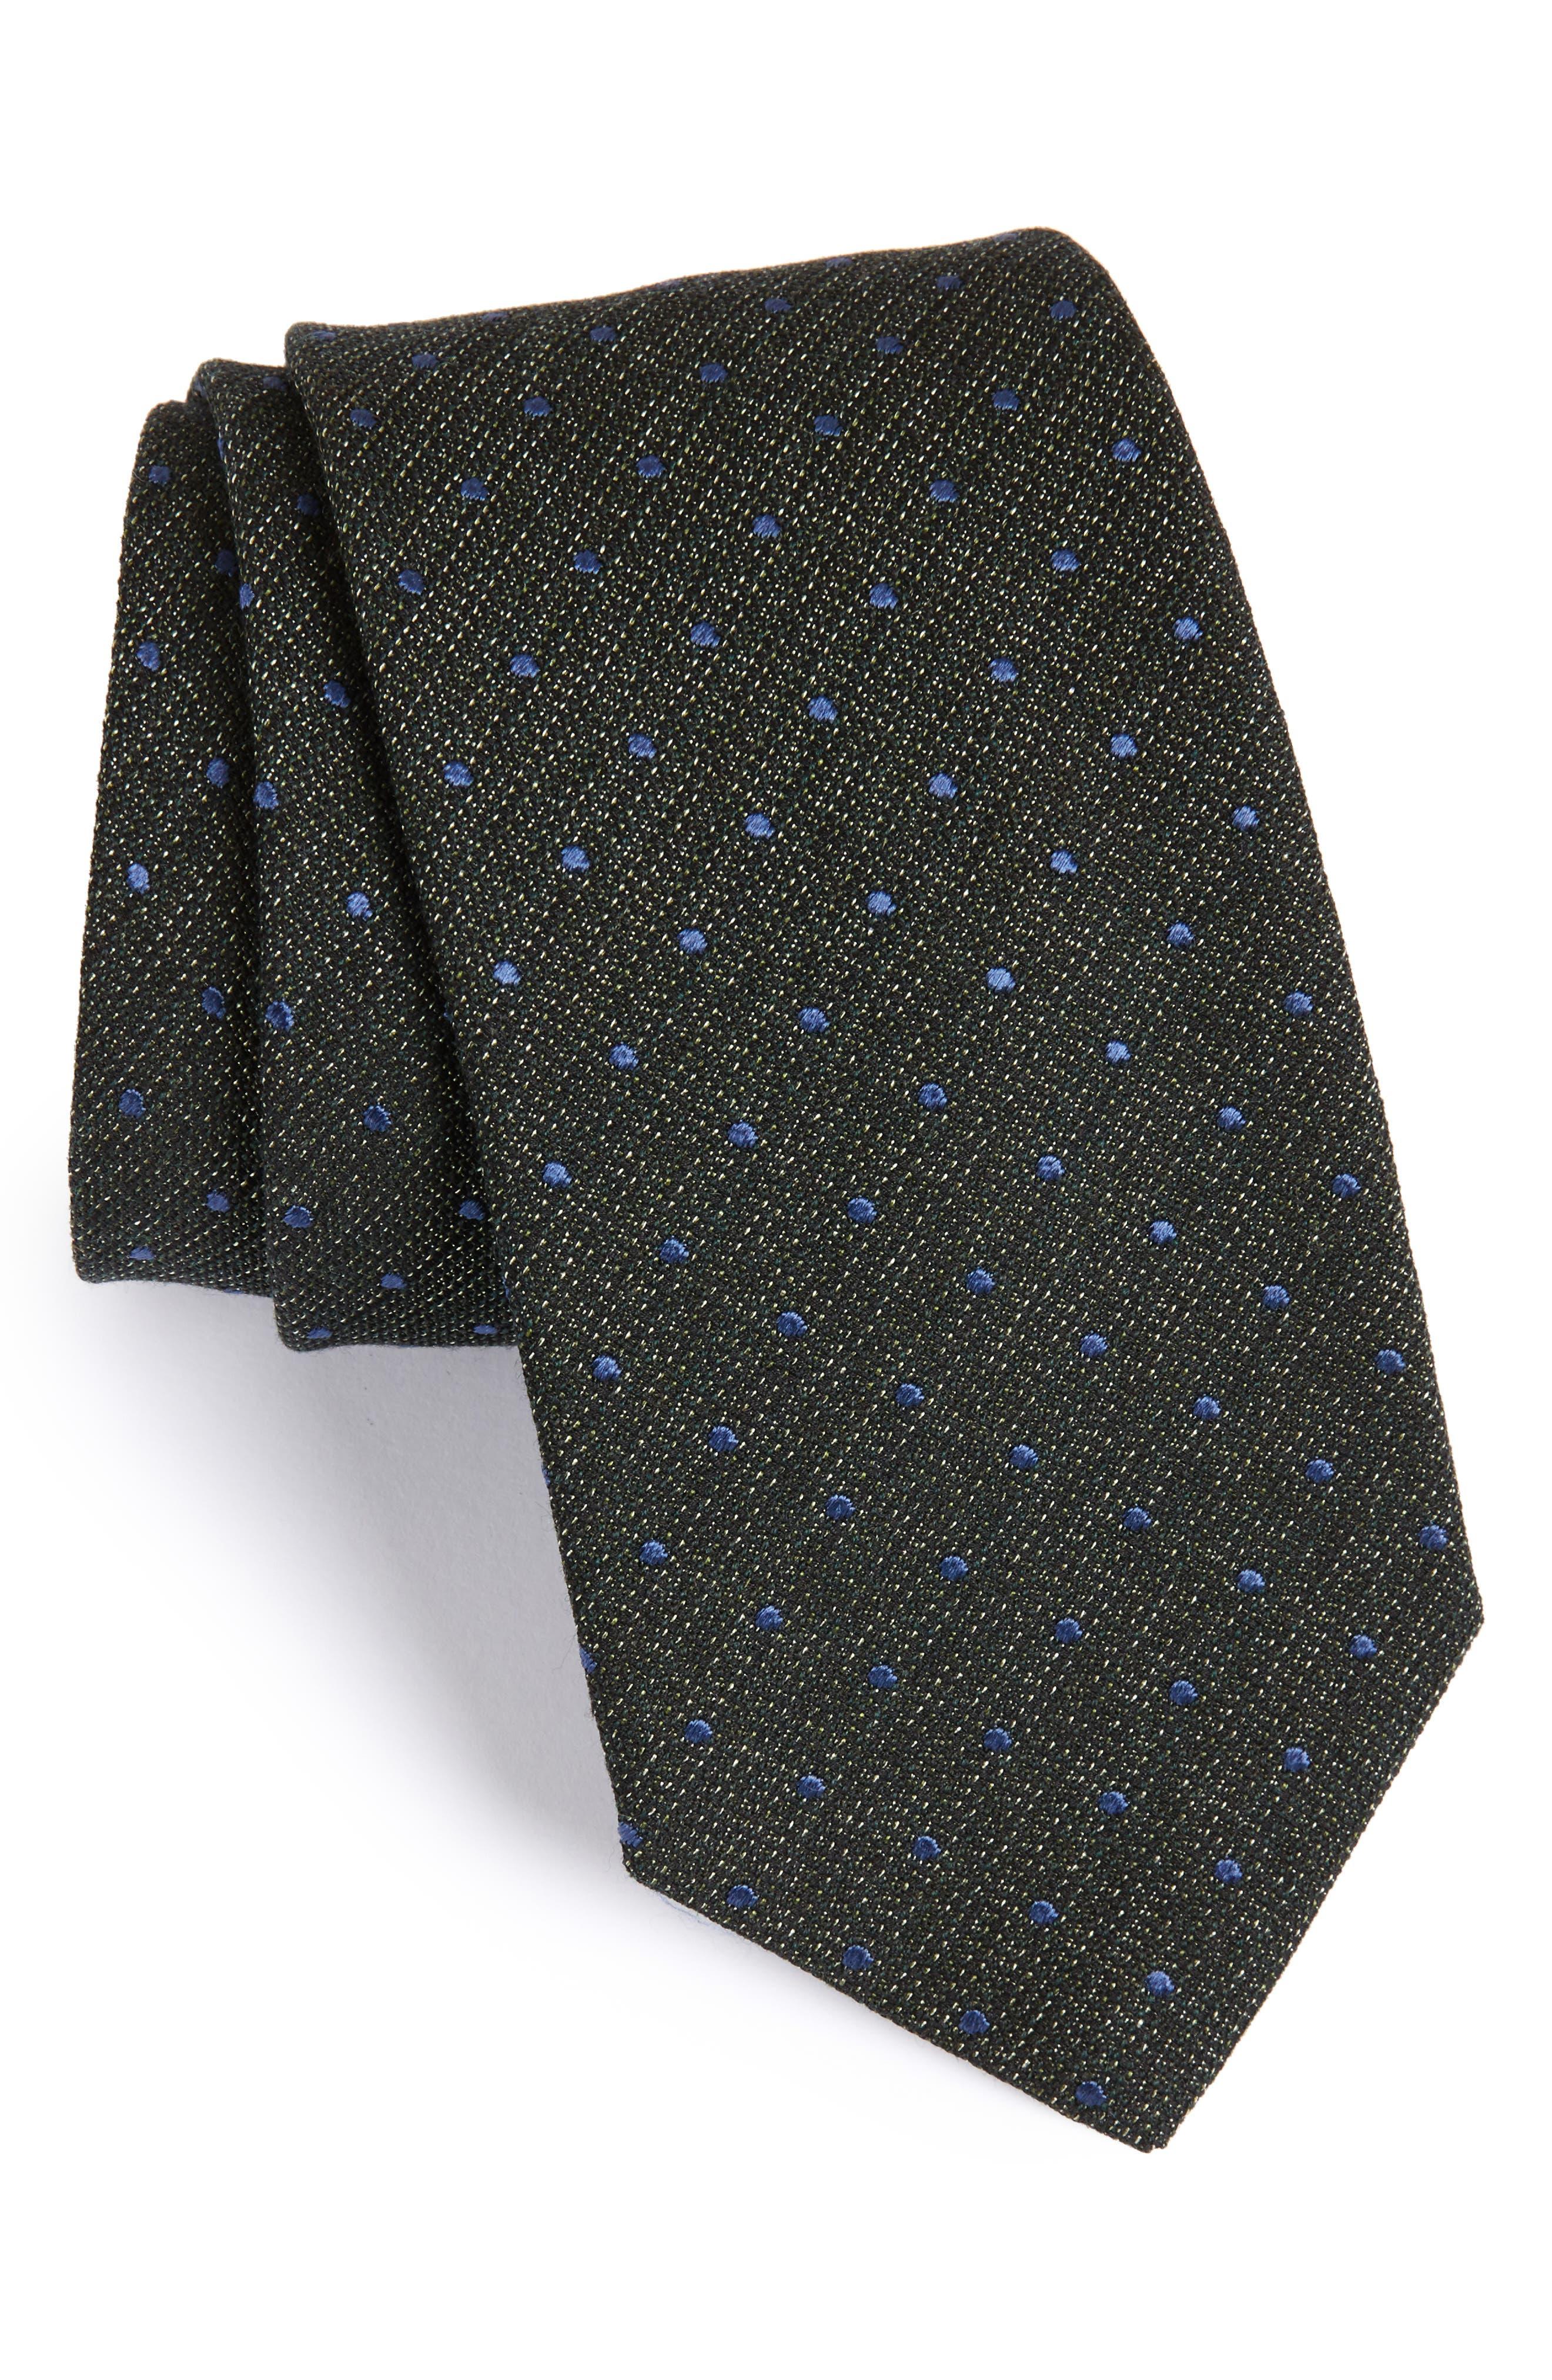 Eton Dot Cotton, Silk & Wool Tie